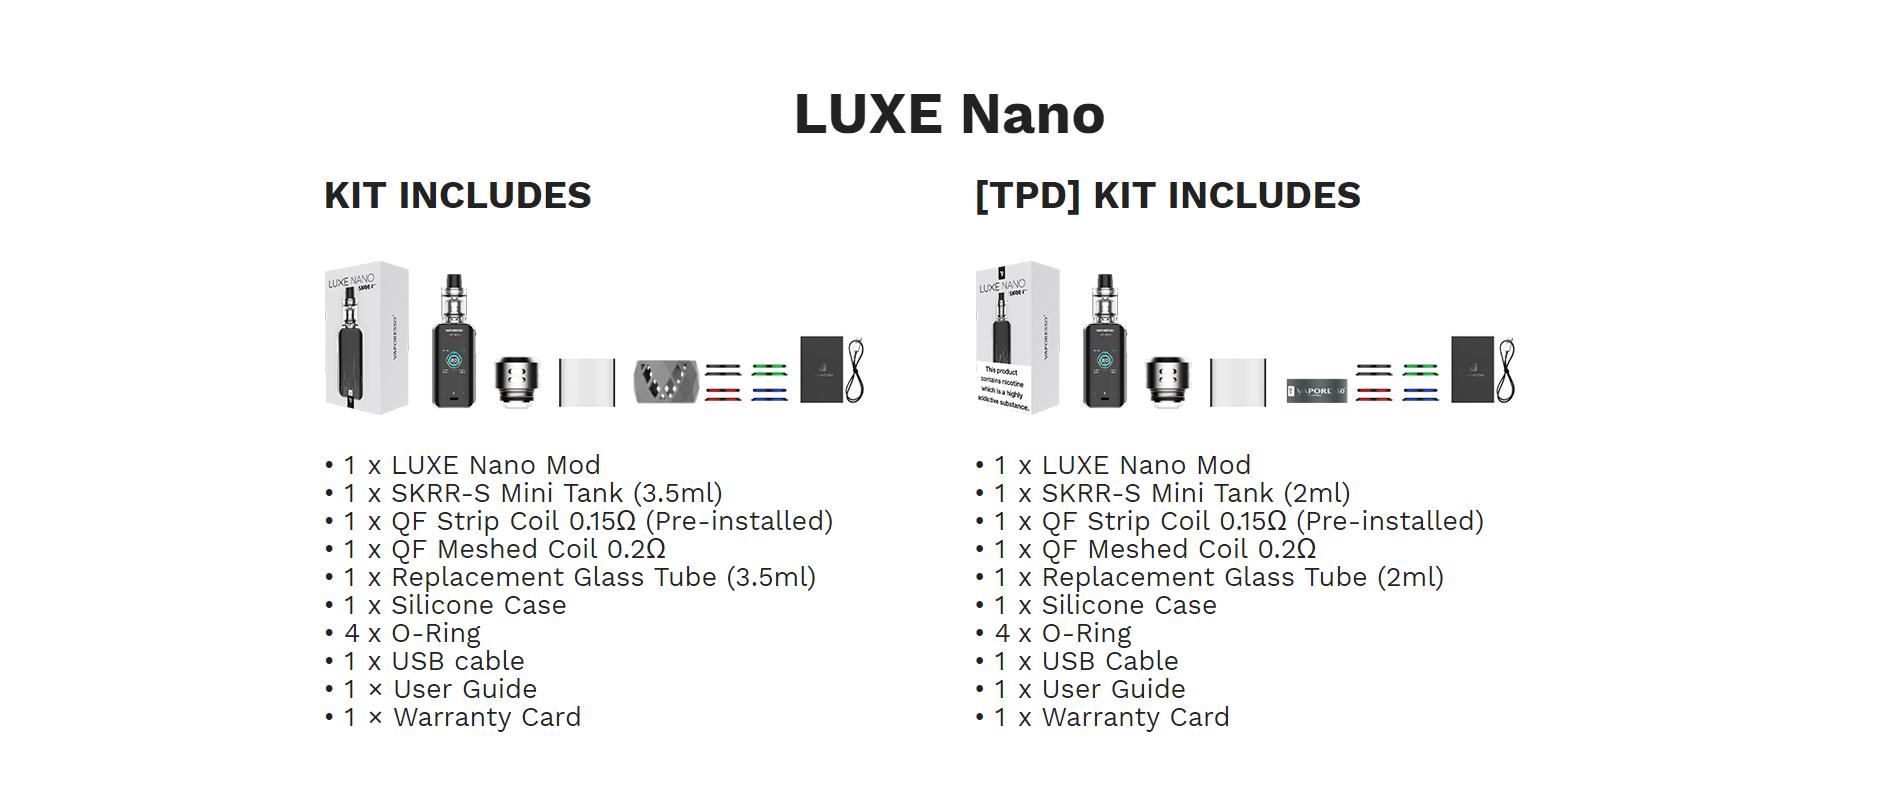 Vaporesso Luxe Nano Kit kopen, Vaporesso Luxe Nano Kit kopen Belgie, Vaporesso Luxe Nano Kit kopen Nederland, Vaporesso Luxe Nano Kit Belgie, Vaporesso Luxe Nano Kit Nederland